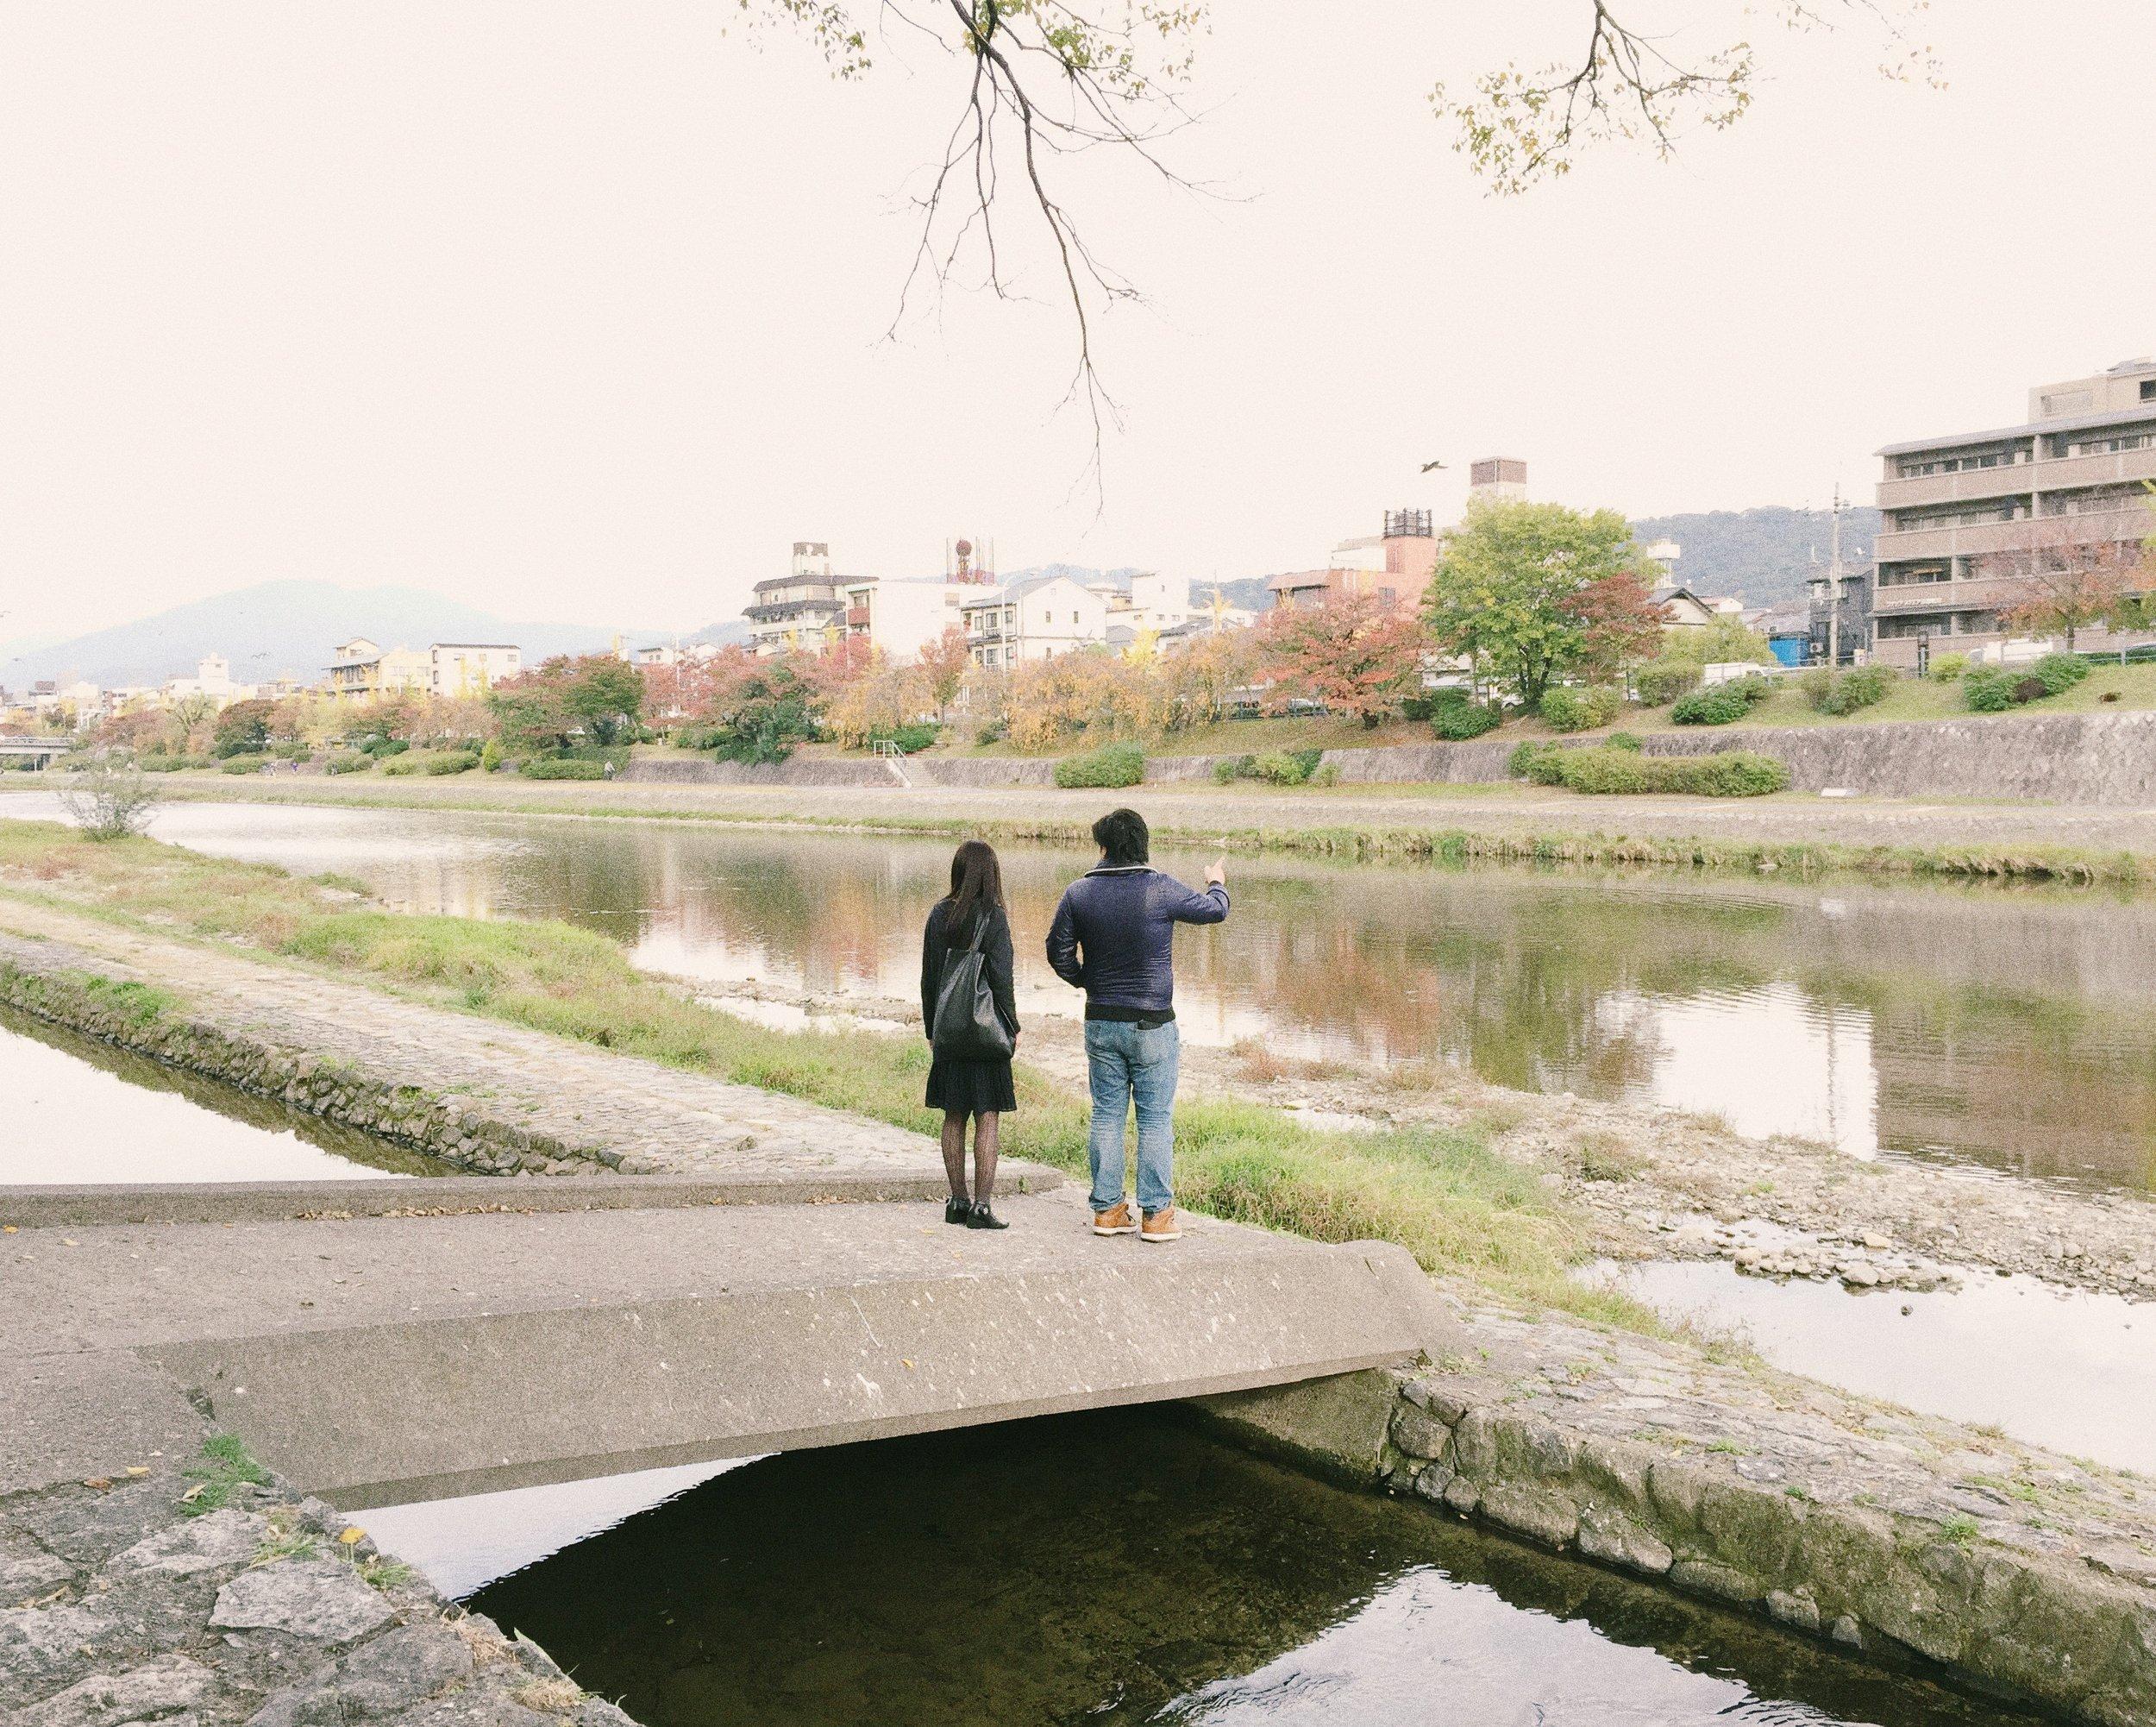 Kamo River, Autumn 2014.